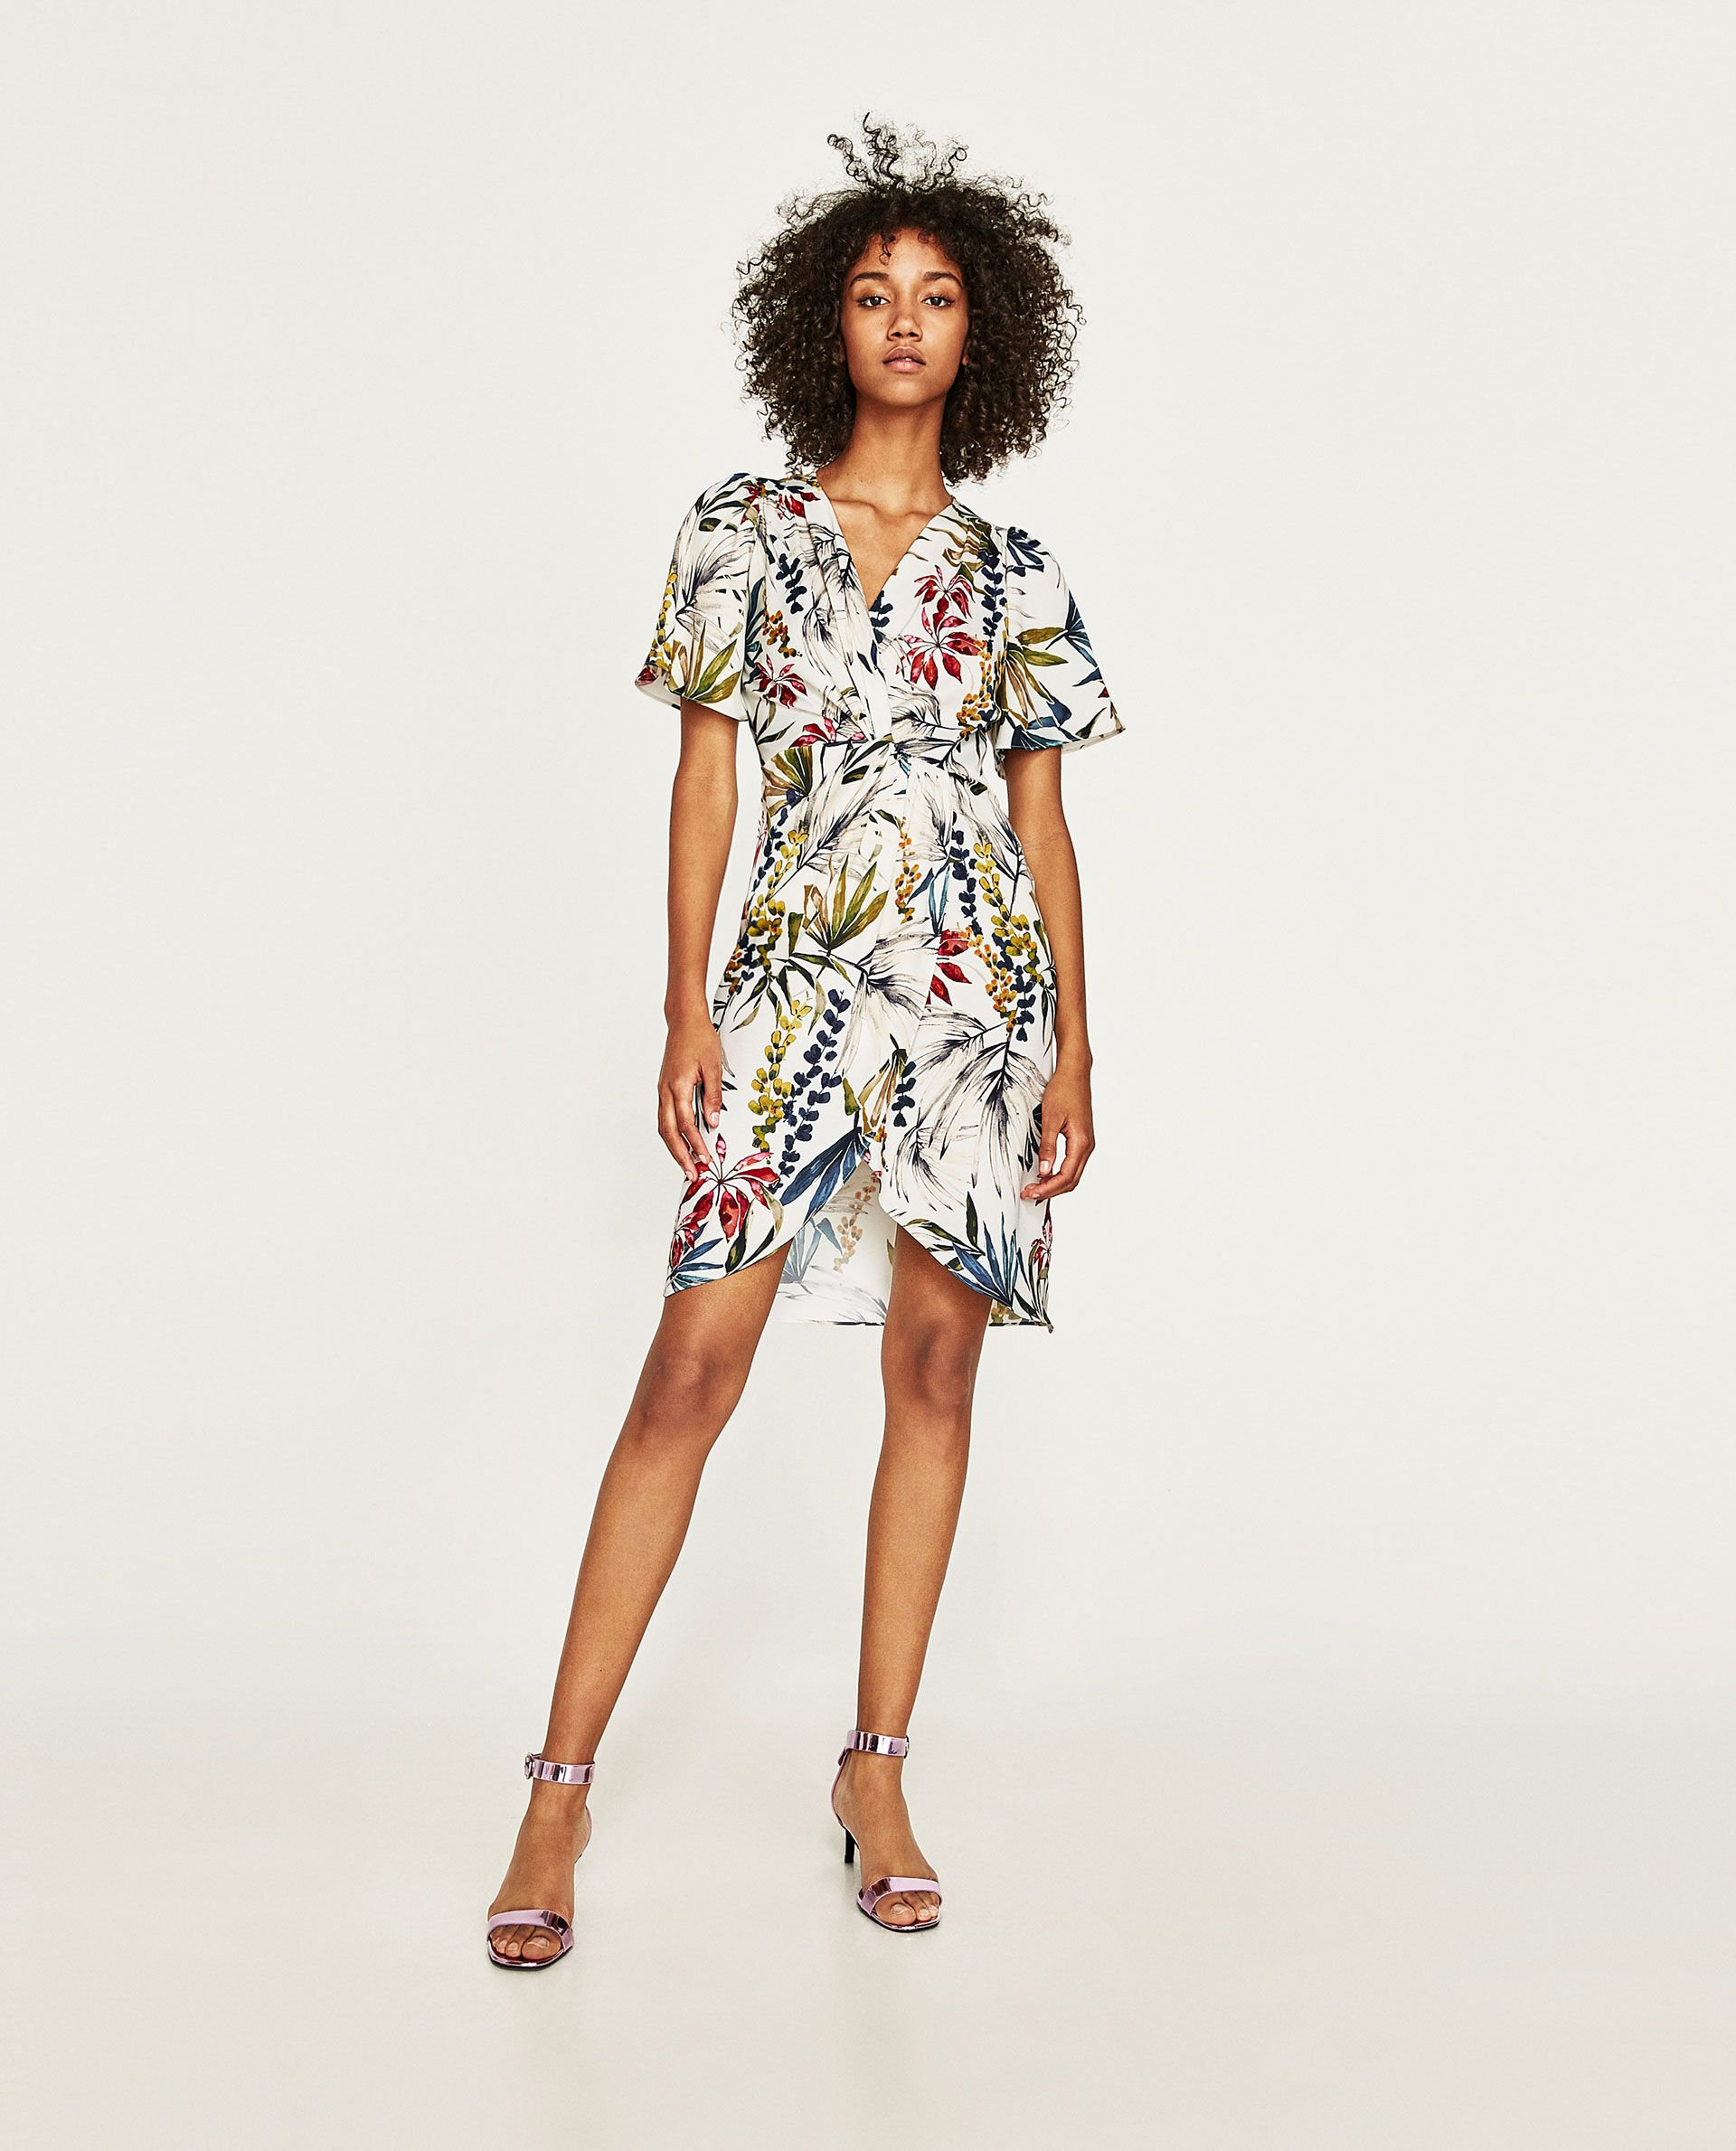 f754a0e0 Image 1 of PRINTED DRESS WITH KNOT from Zara | Attire | Striped midi ...